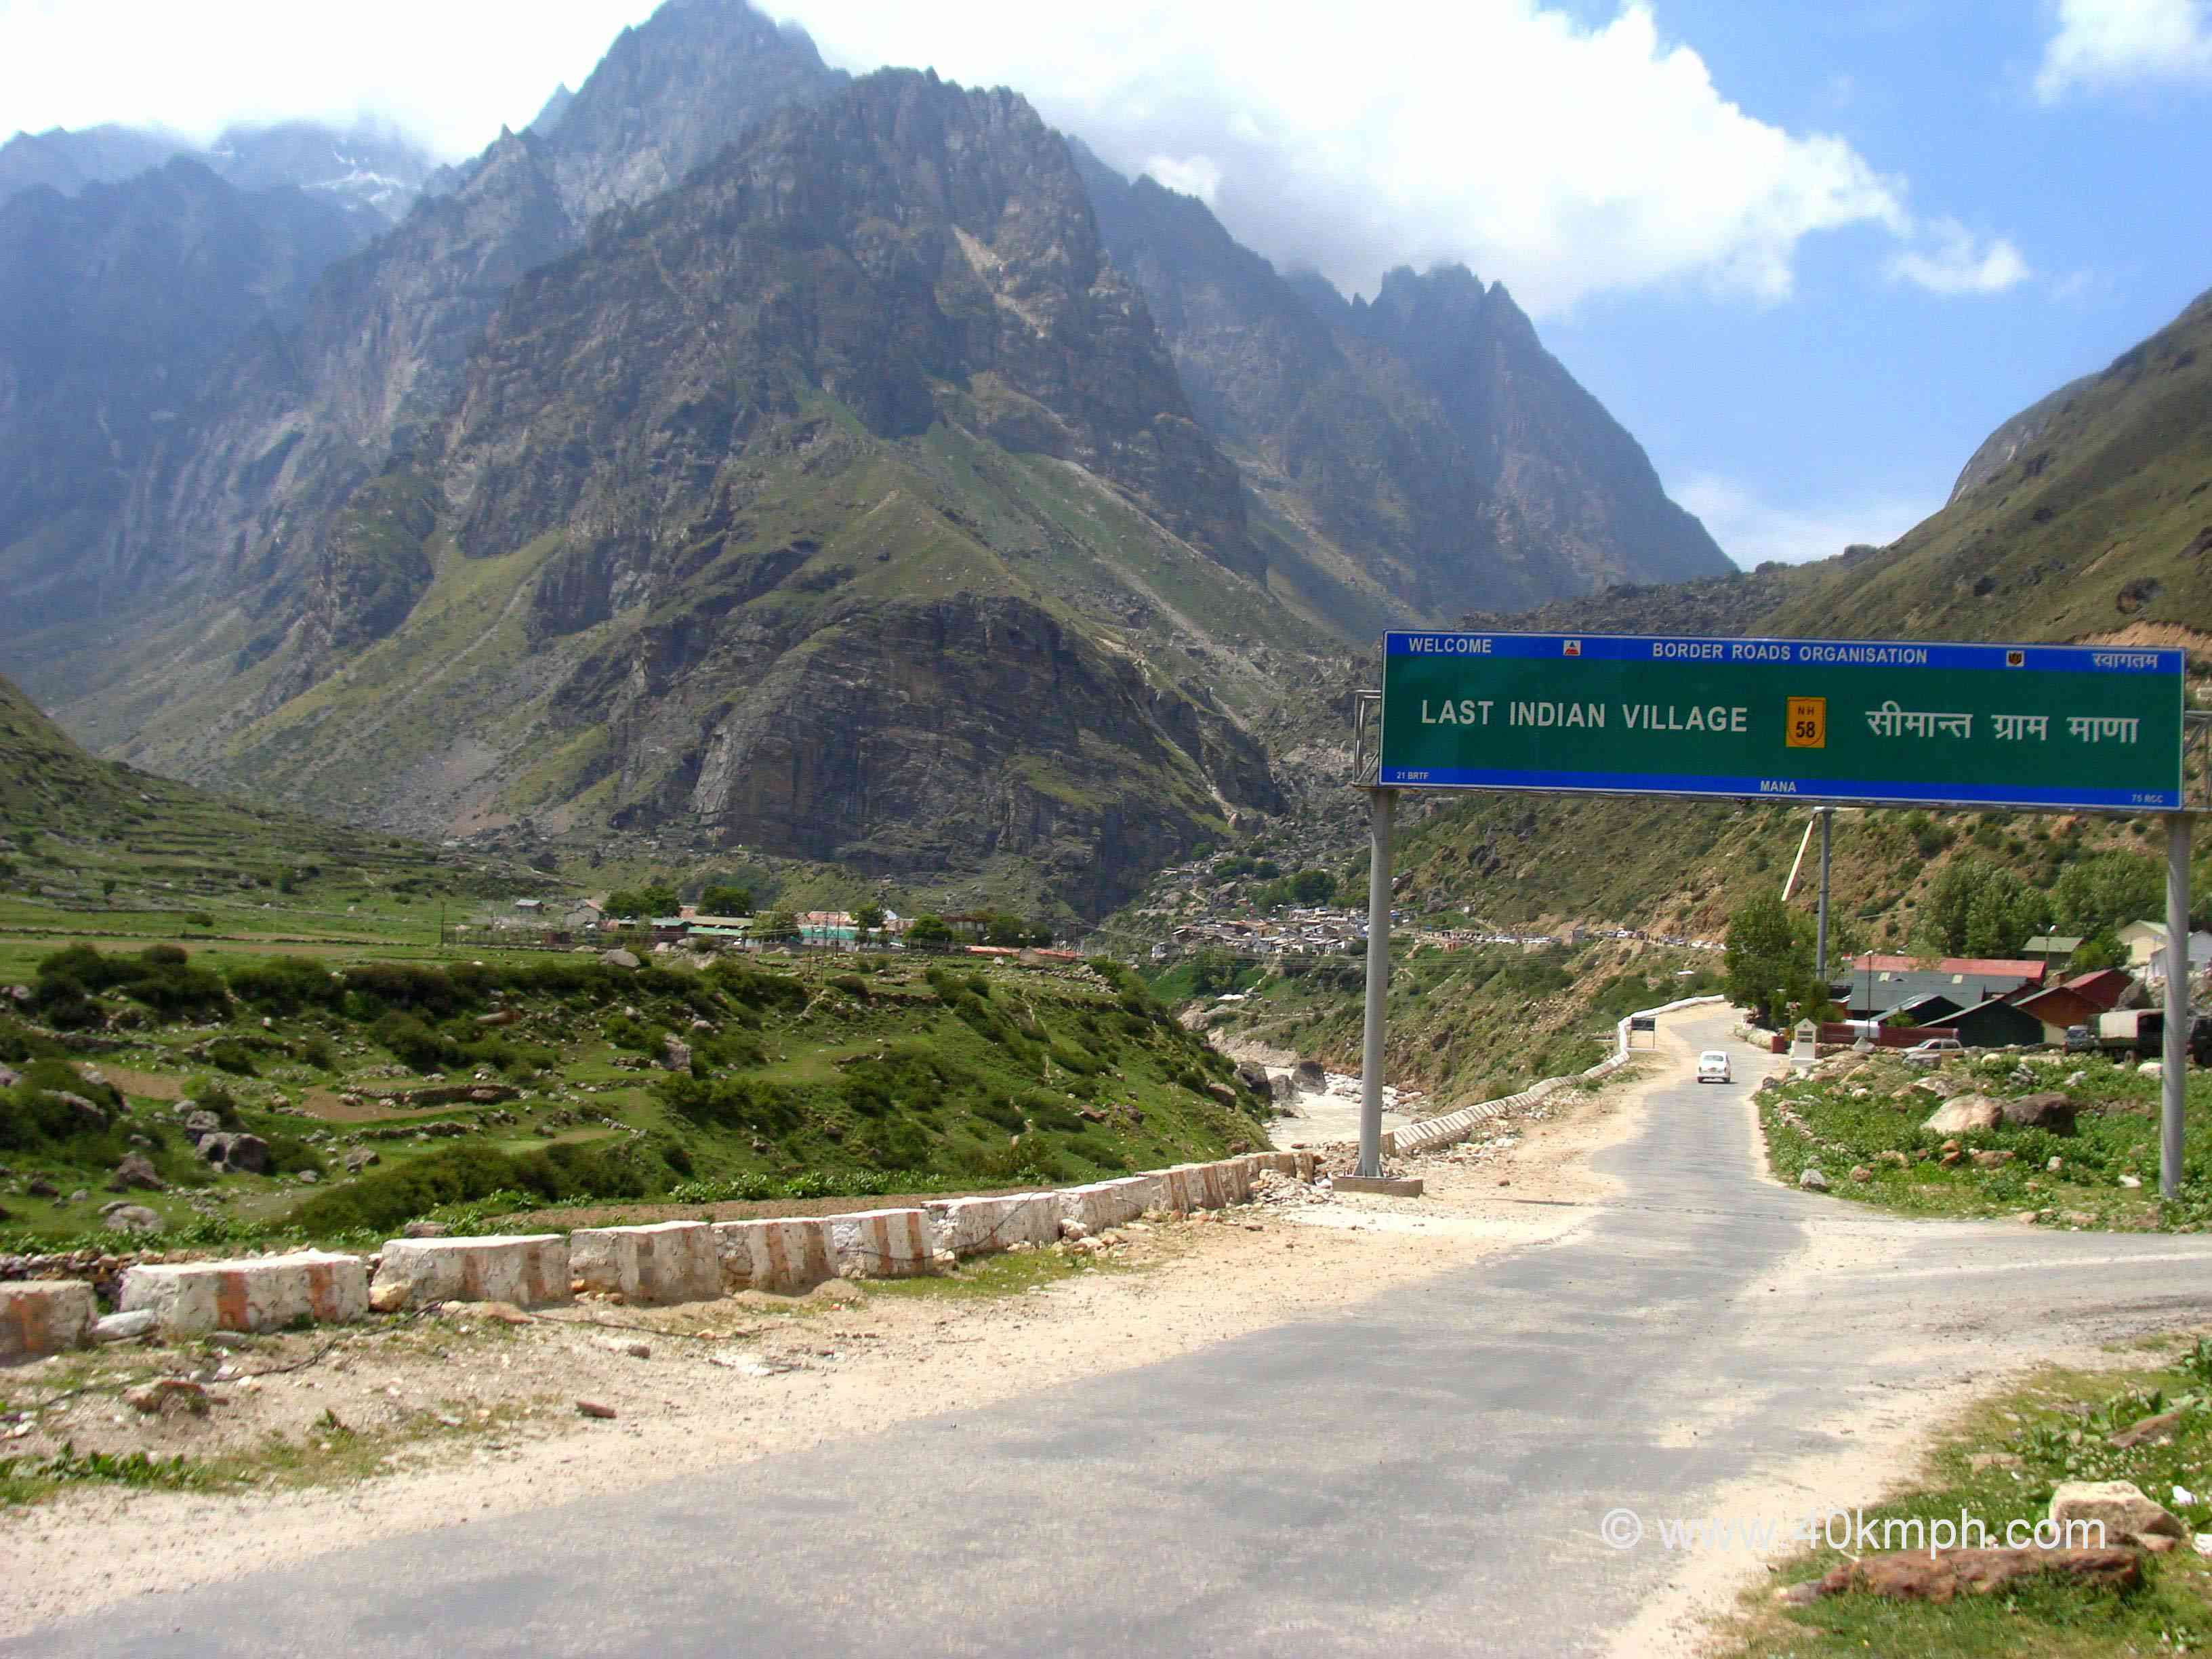 Last Indian Village - Mana Gaon in Uttarakhand